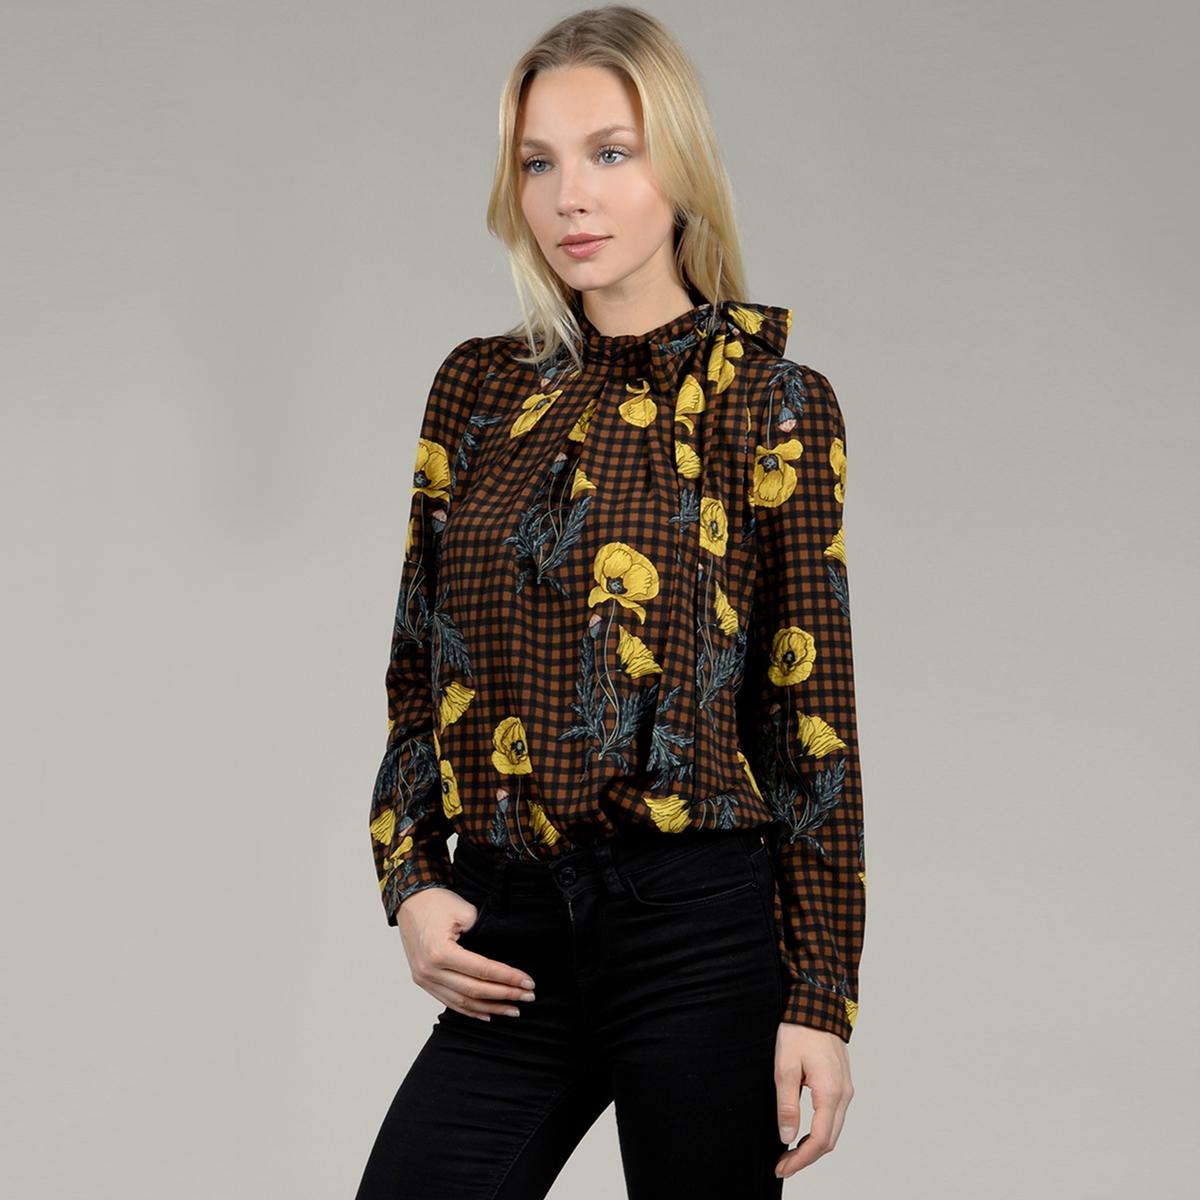 Блузка MOLLY BRACKEN 15522554 от LaRedoute